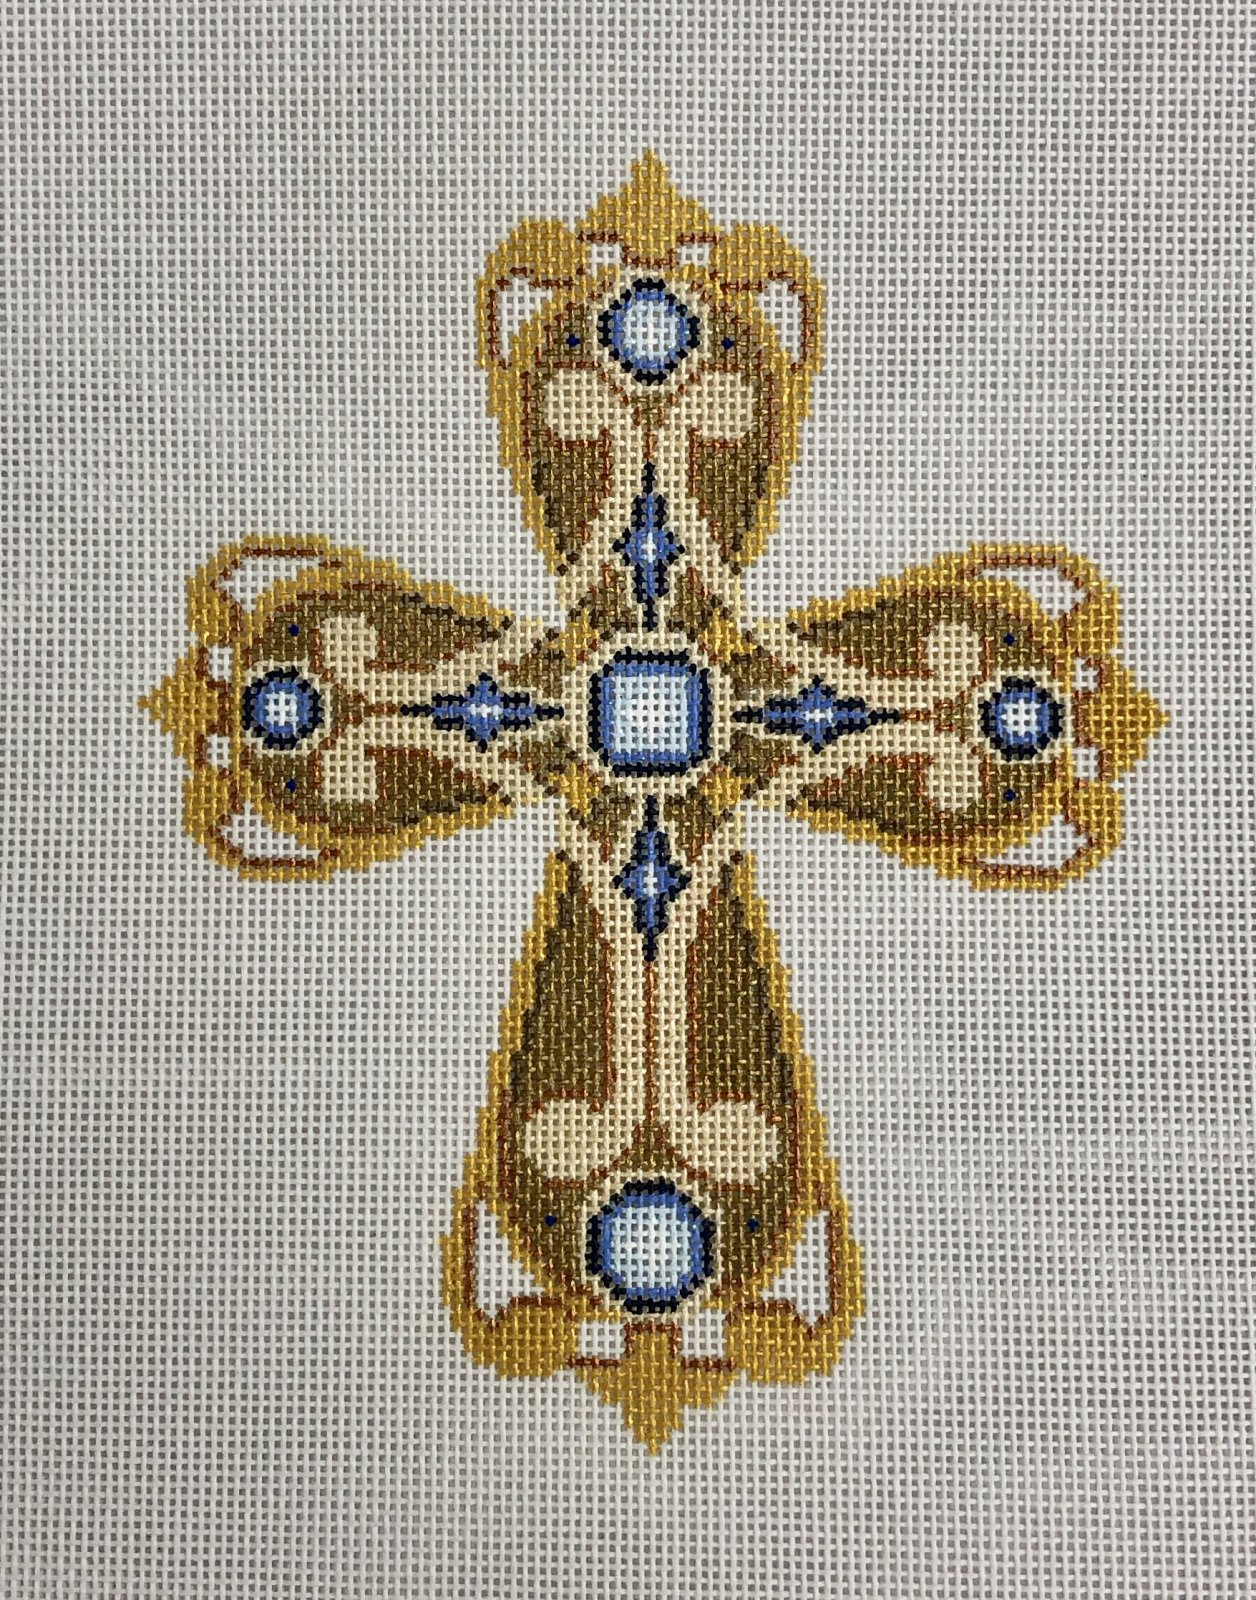 cross gold & copper w blue, large